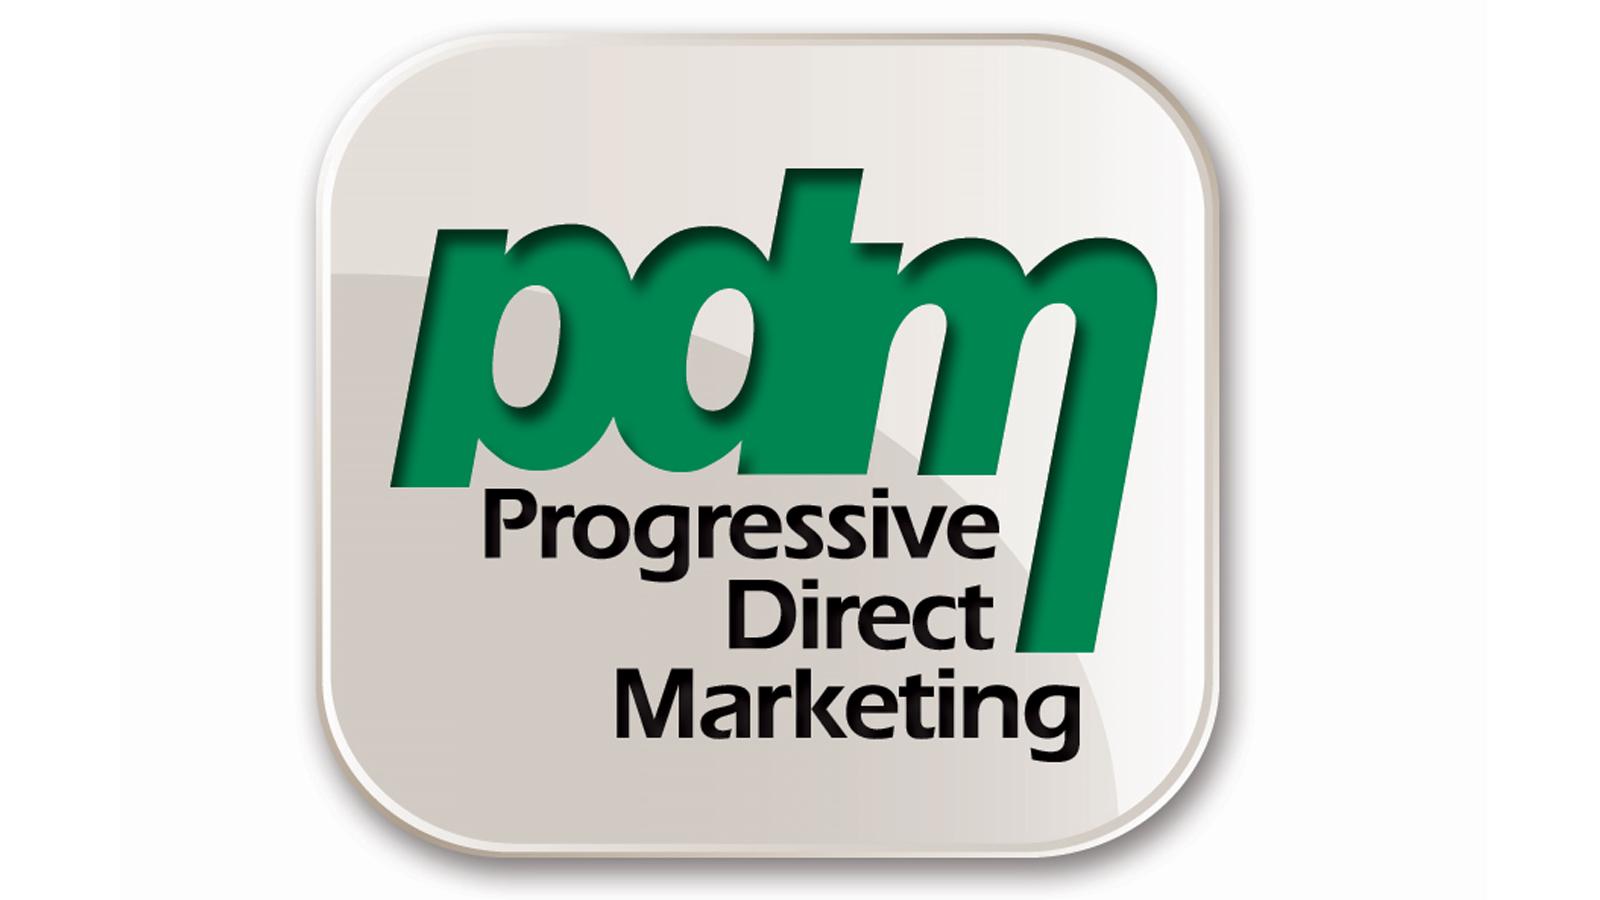 Progressive Direct Marketing